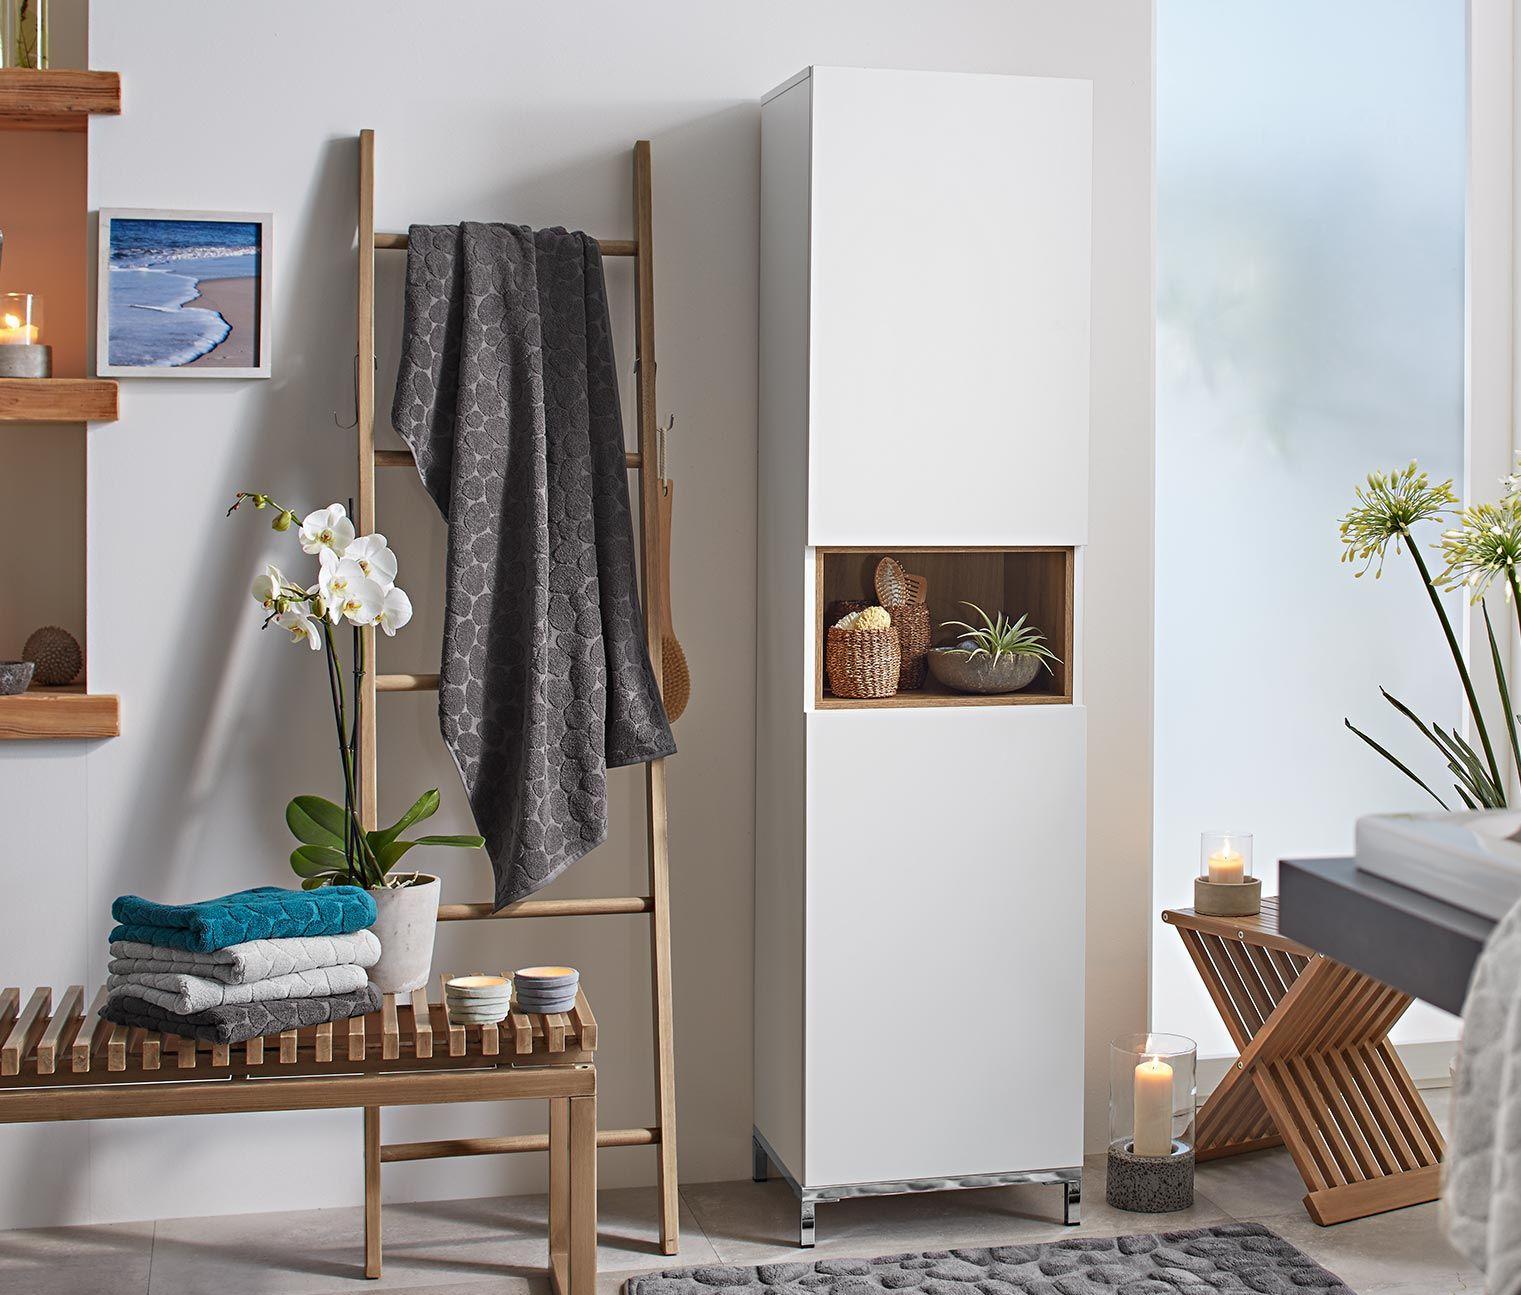 Bad-Hochschrank online bestellen bei Tchibo 323983 | Bo - møbler og ...